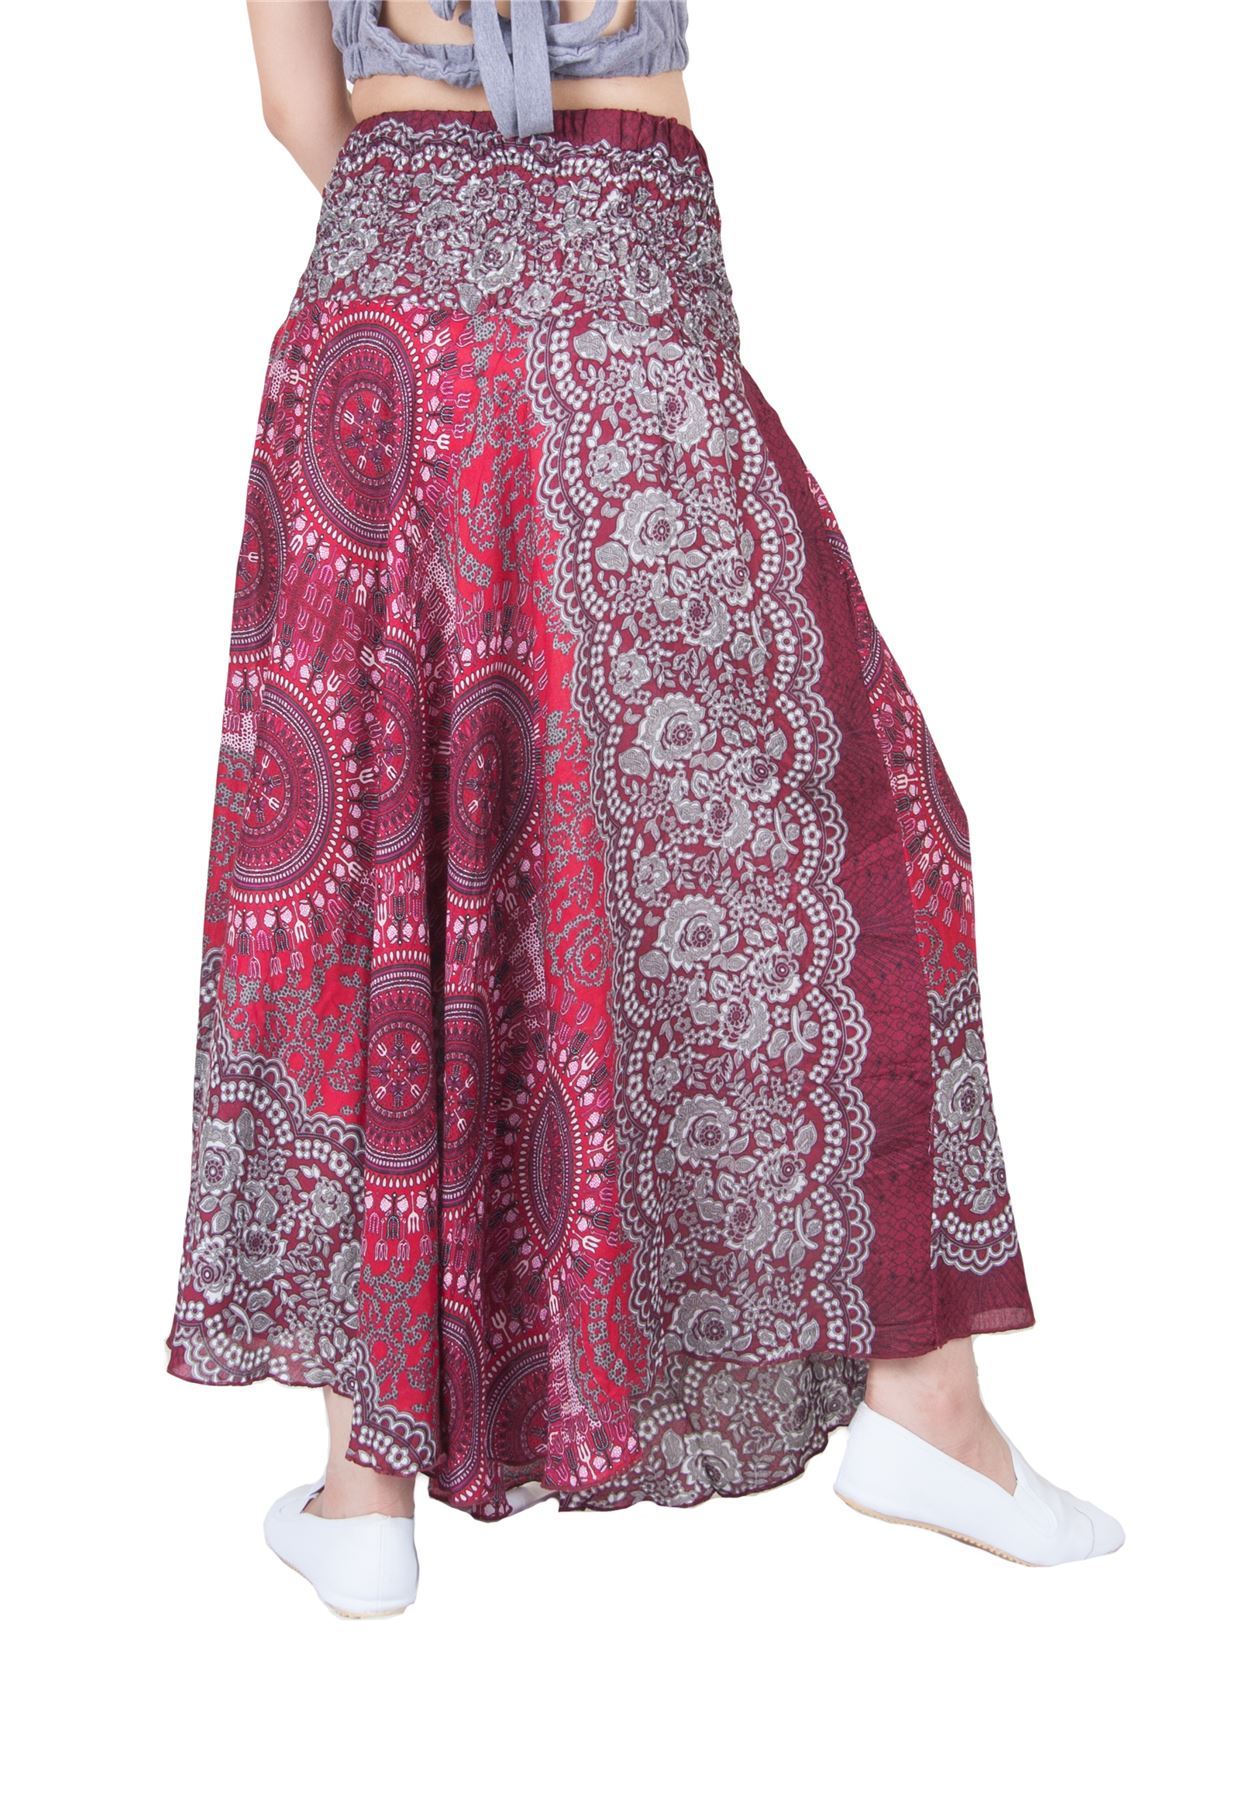 Lofbaz Womenu2019s Bohemian Boho Hippie Gypsy Long Skirts Dresses | eBay